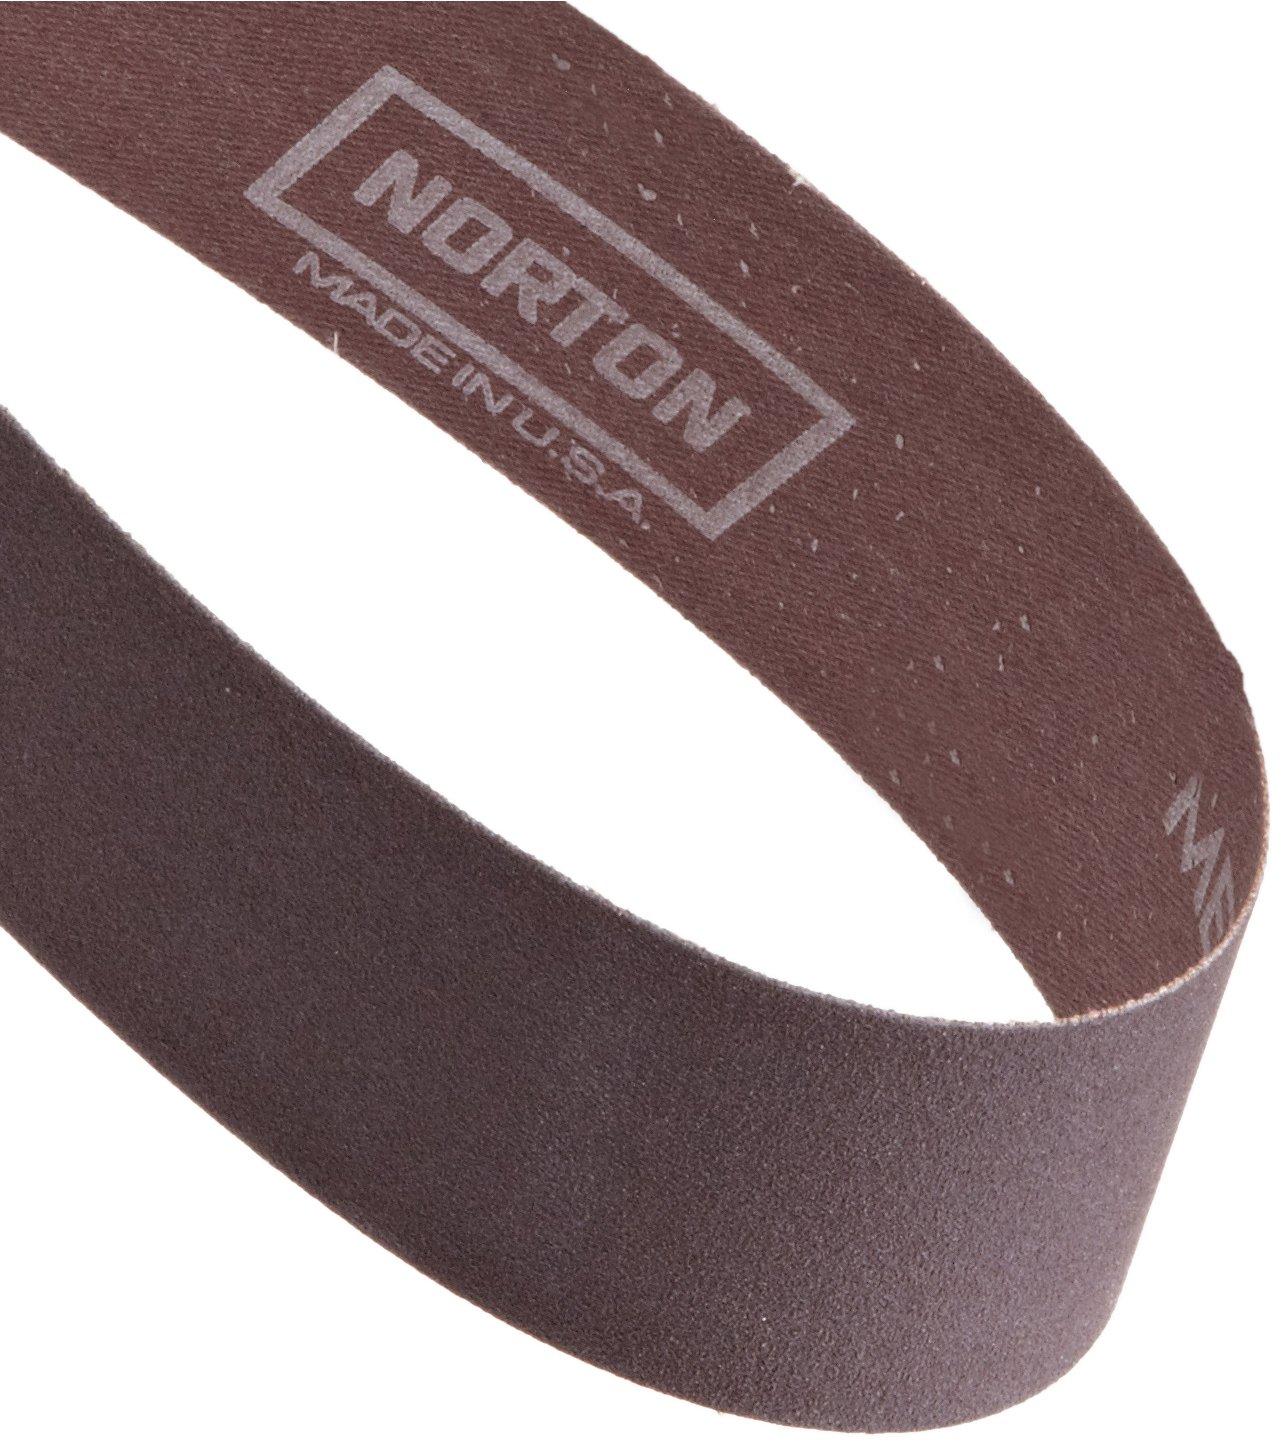 Aluminum Oxide 72 Length Grit 120 Pack of 5 Norton Metalite R228 Benchstand Abrasive Belt Cotton Backing 2 Width